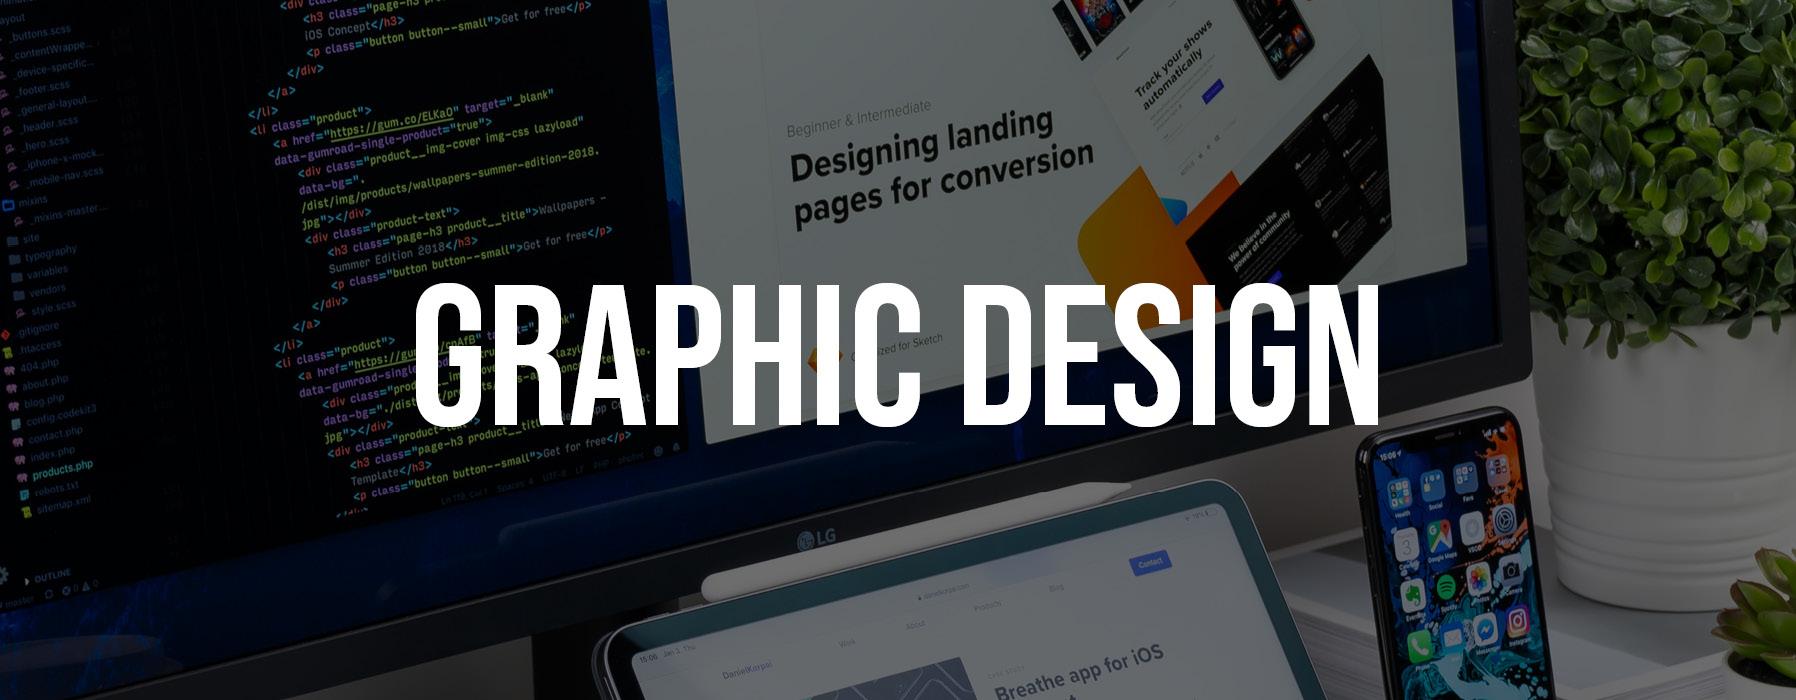 graphic design.jpg